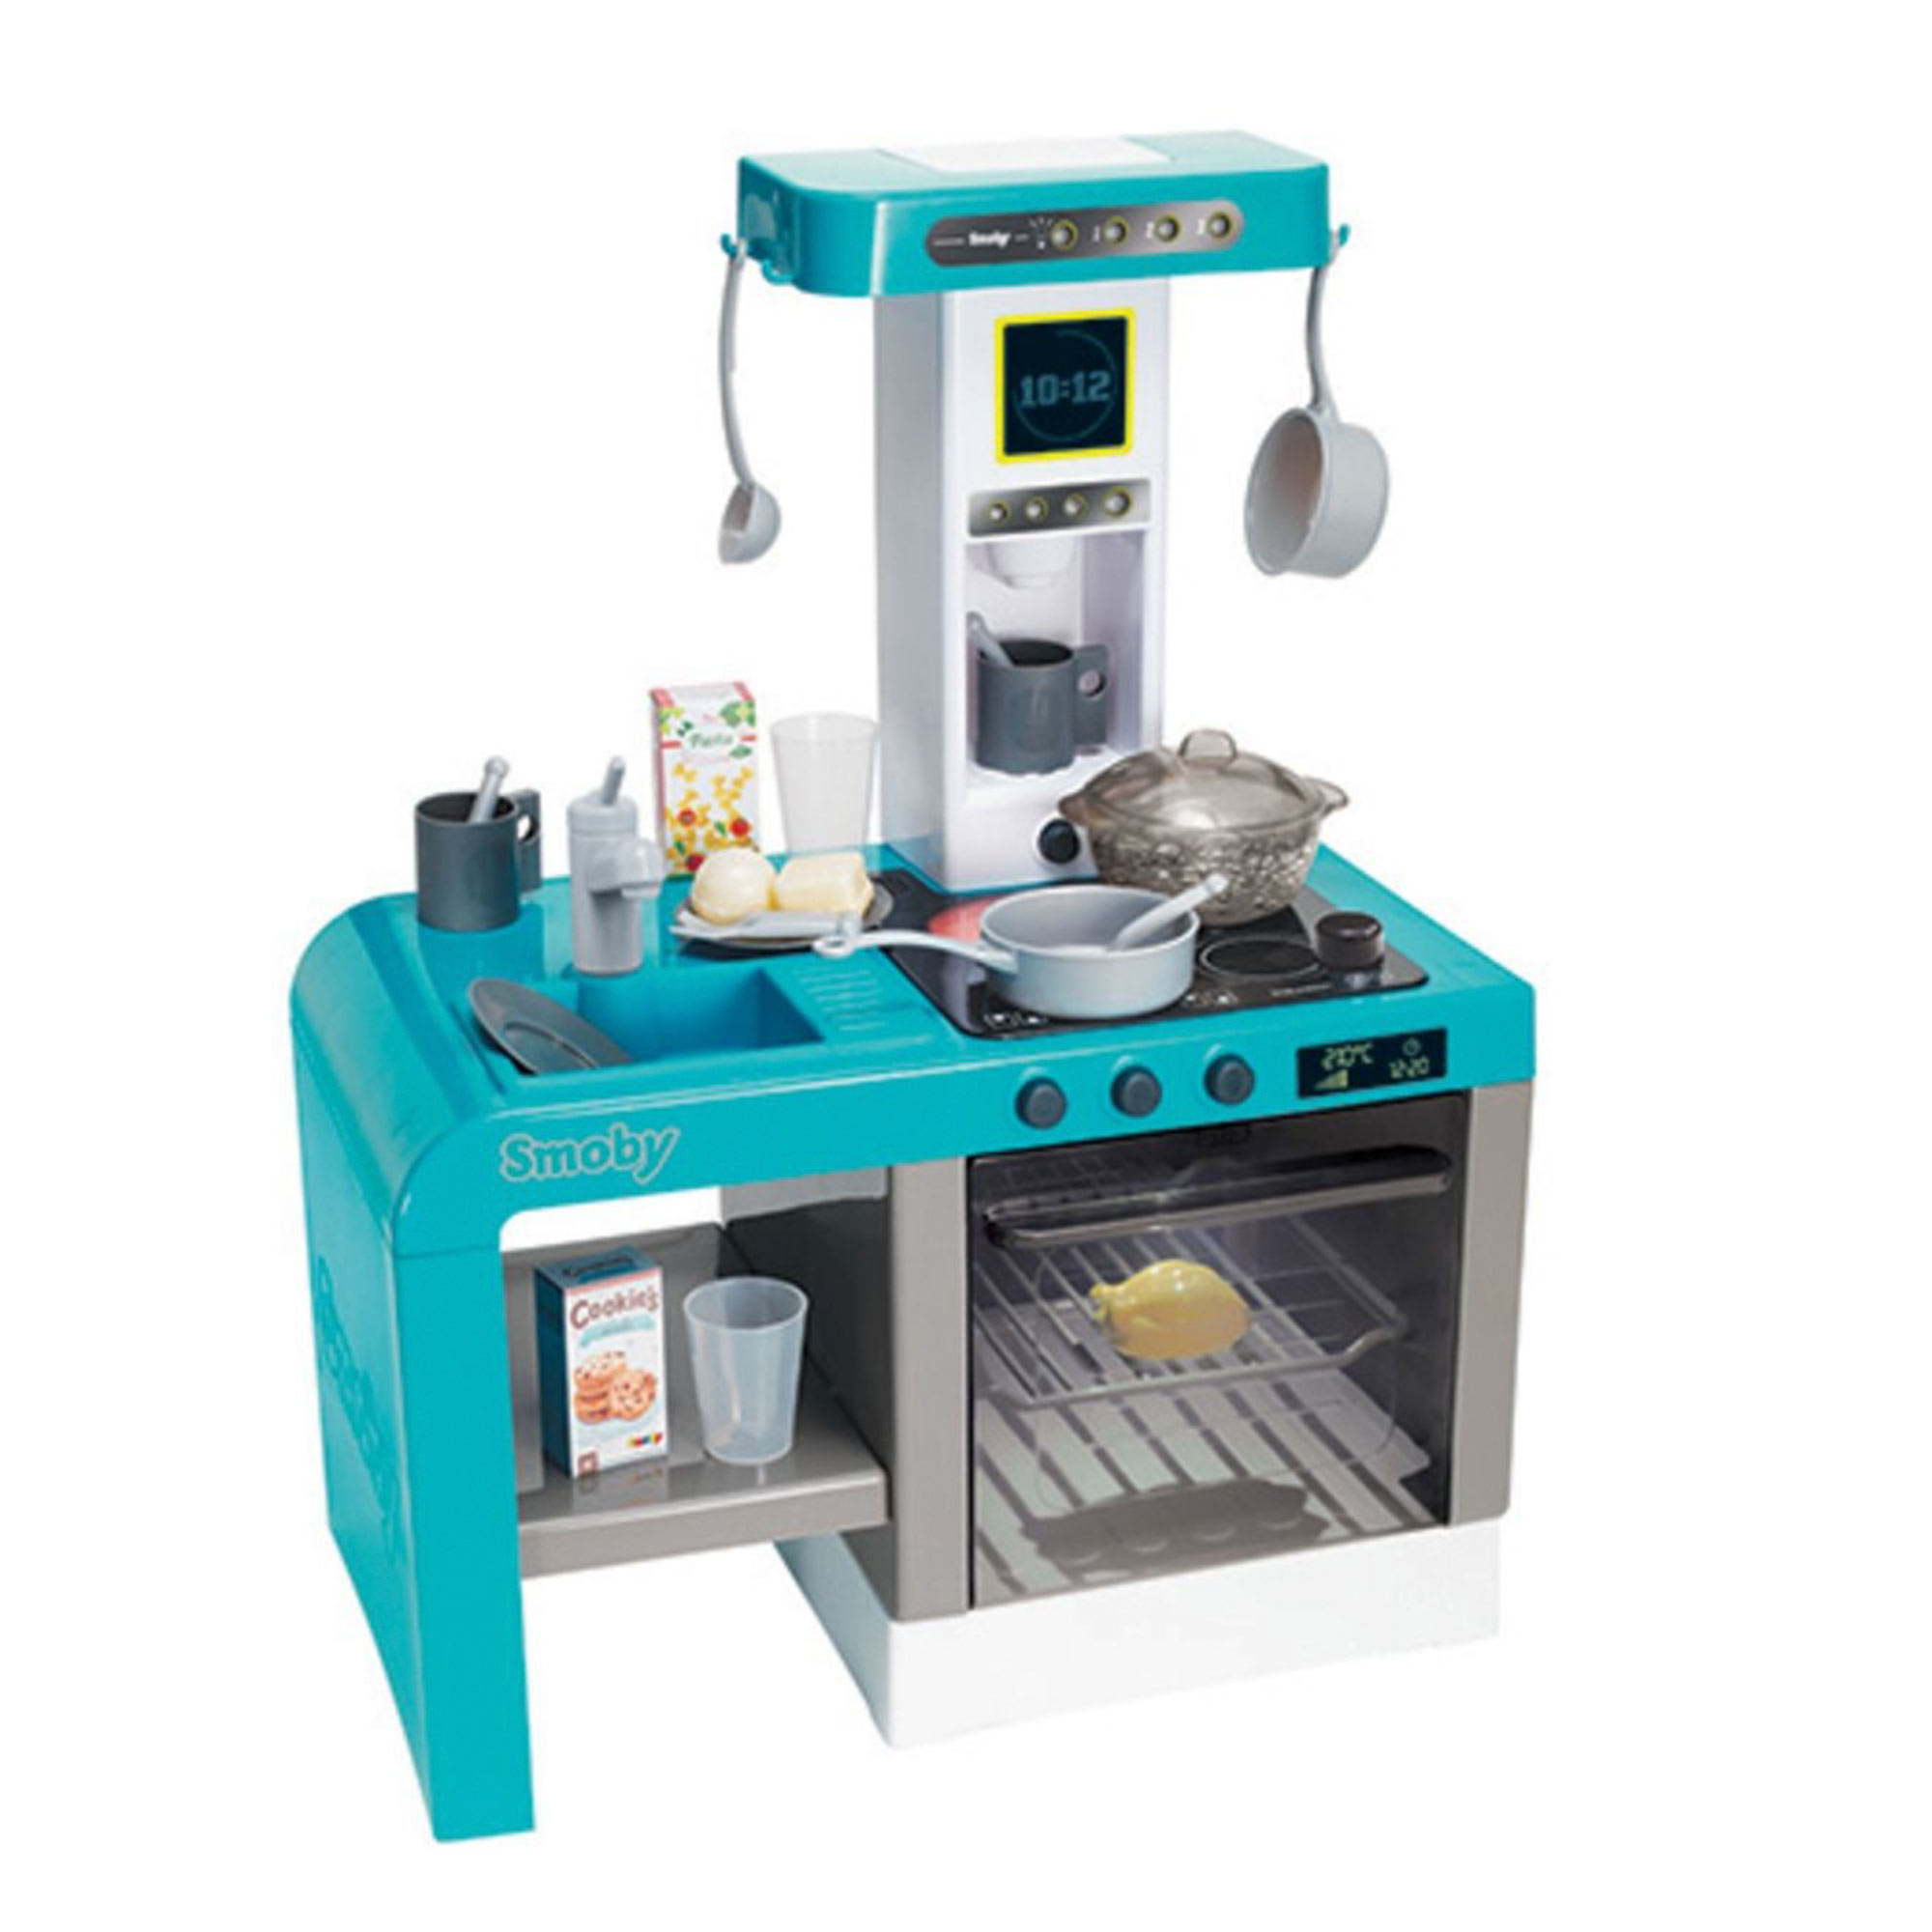 Электронная детская кухня Smoby Tefal Cheftronic